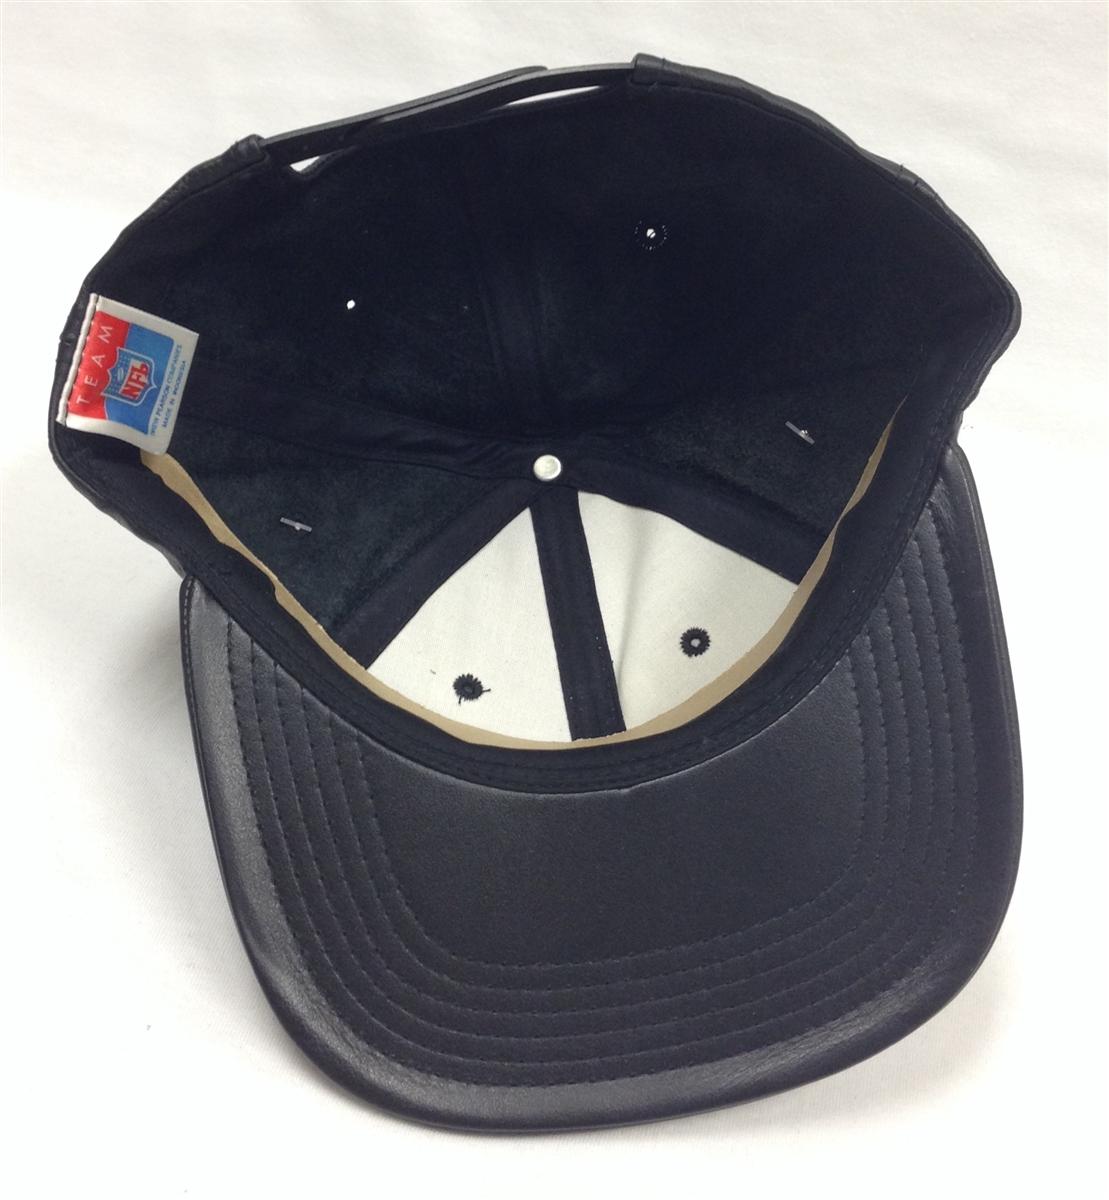 e846a2fc518ae Team NFL Miami Dolphins Black Leather Snapback